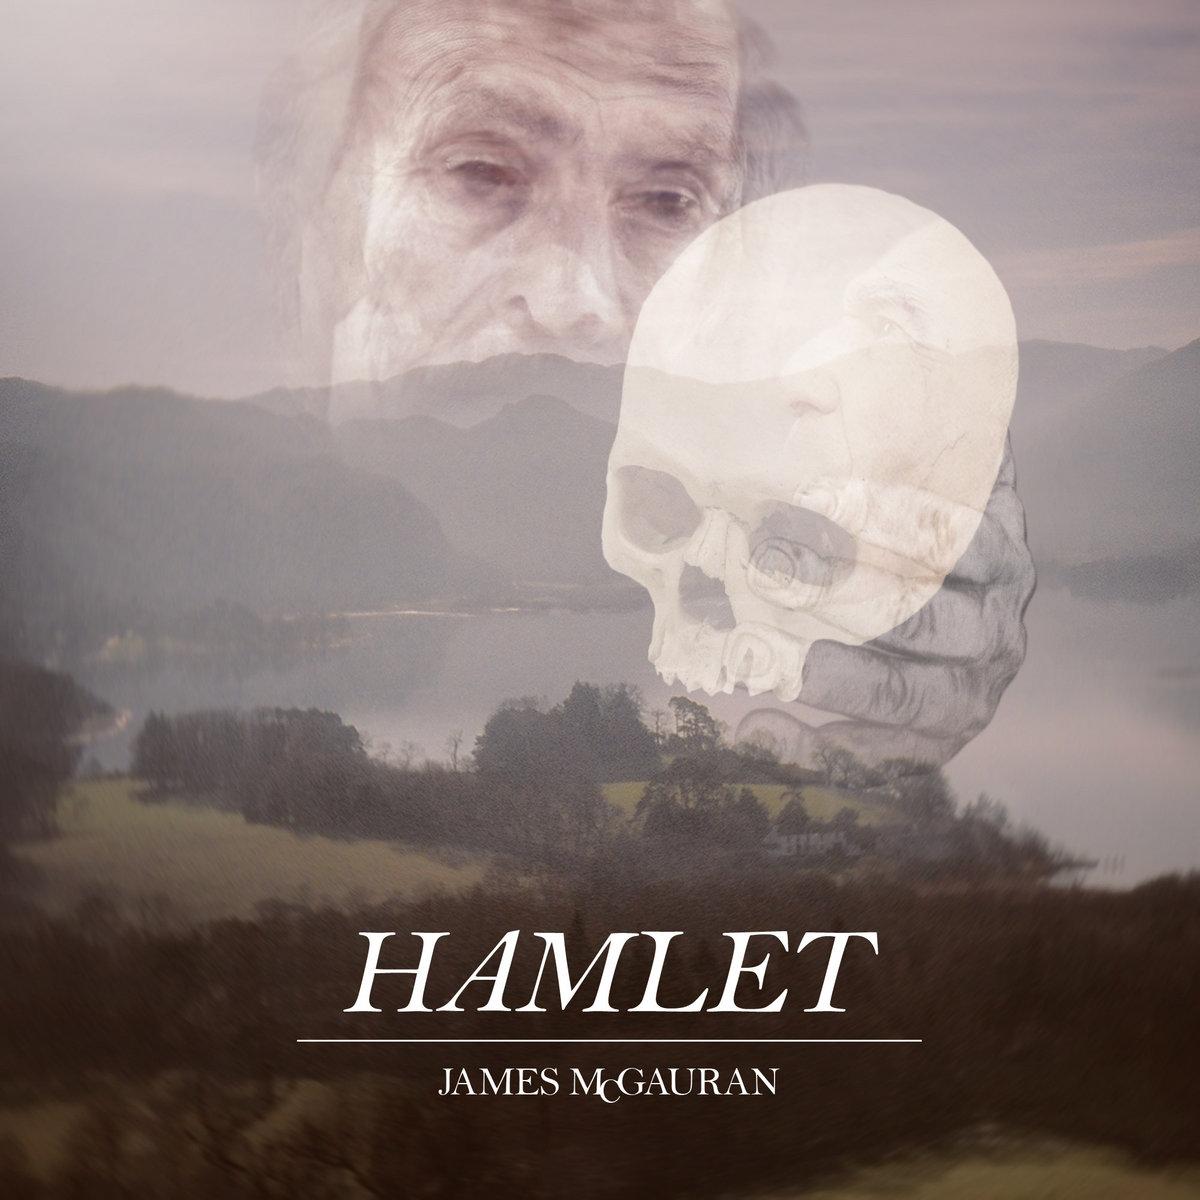 dumb show hamlet